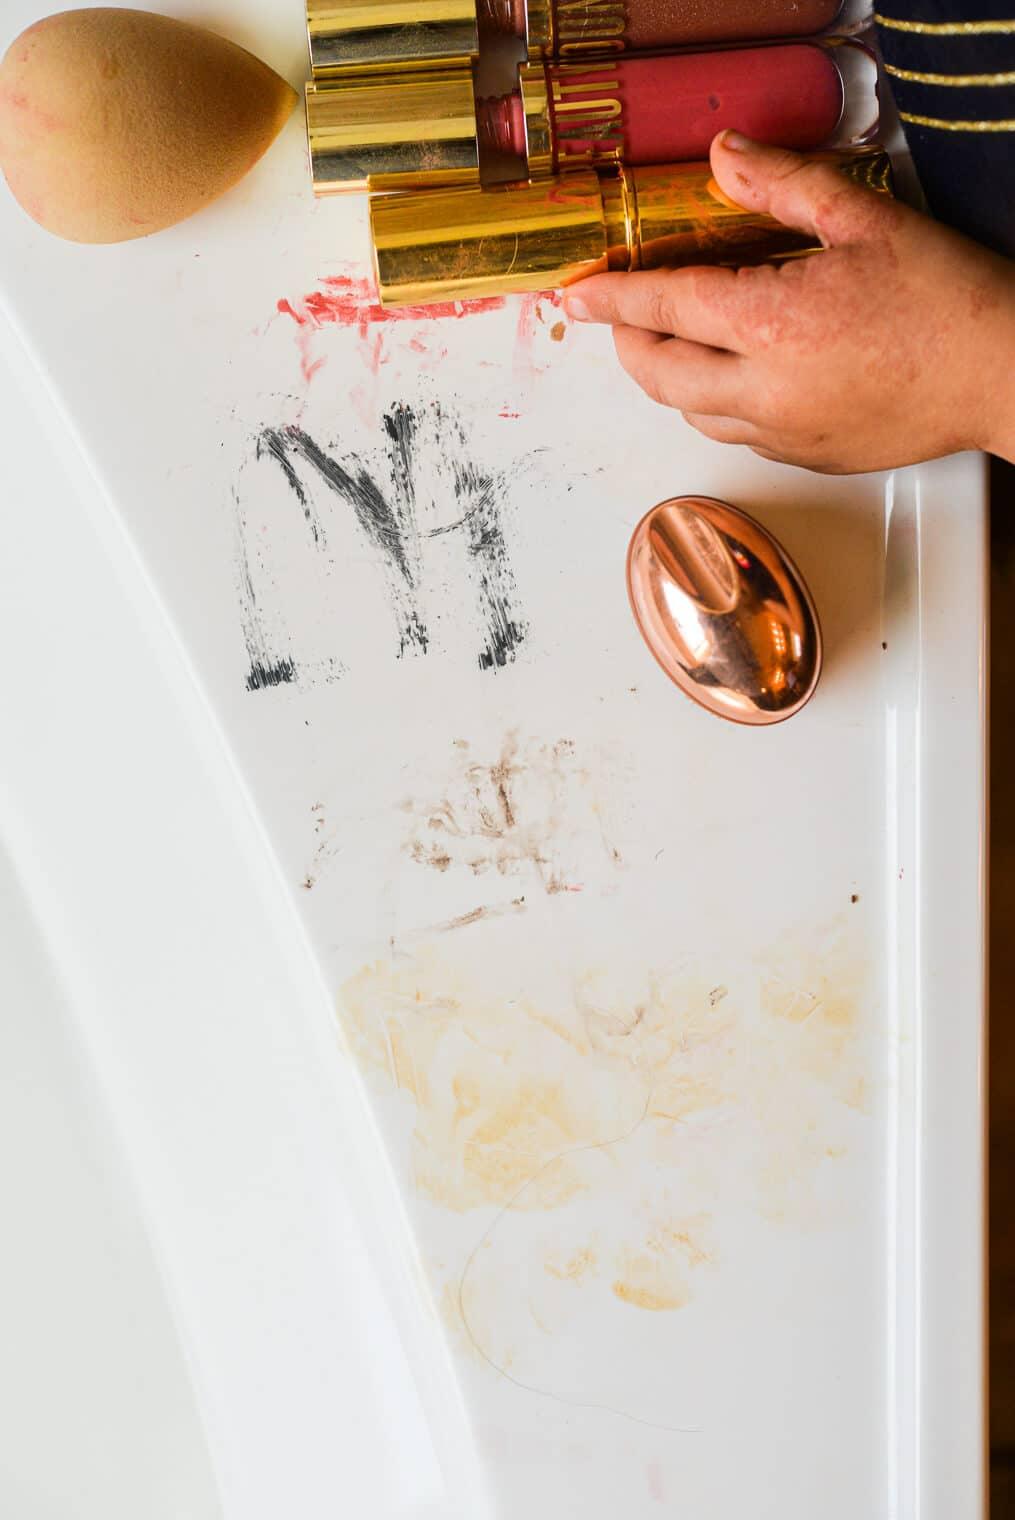 a bathroom tub covered on makeup smears